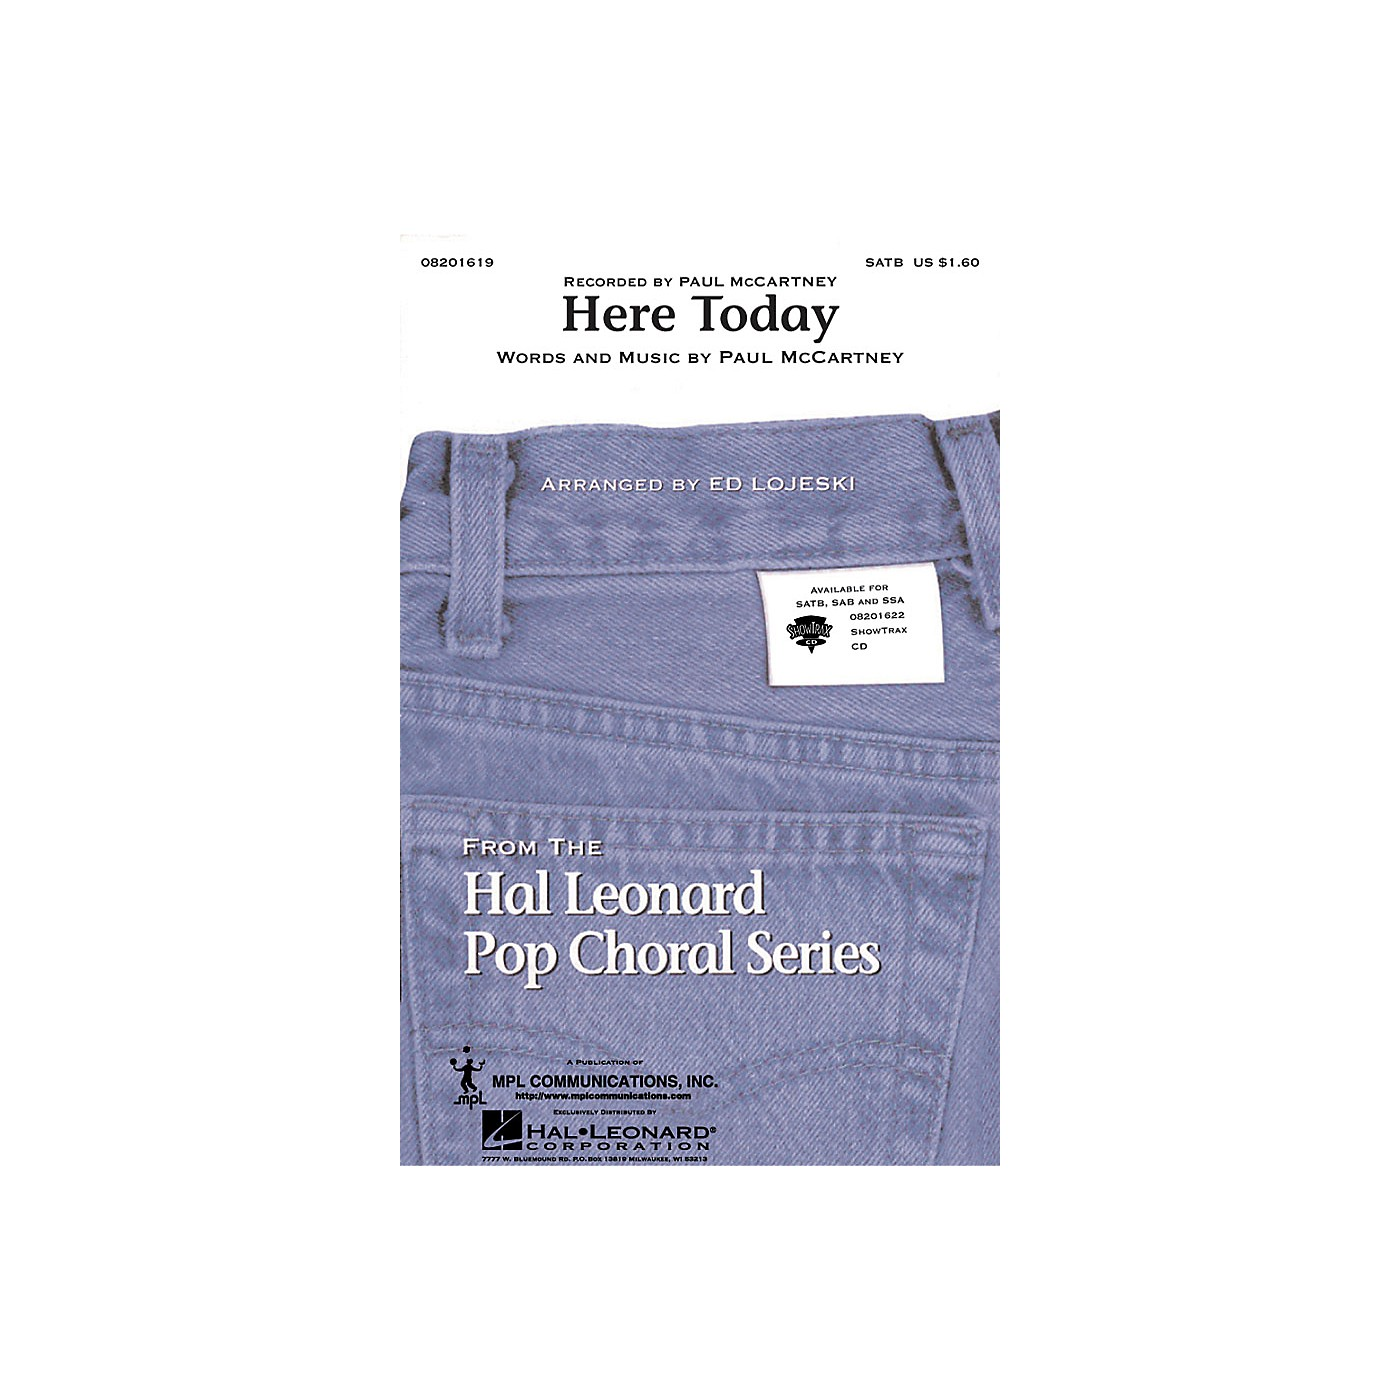 Hal Leonard Here Today ShowTrax CD by Paul McCartney Arranged by Ed Lojeski thumbnail